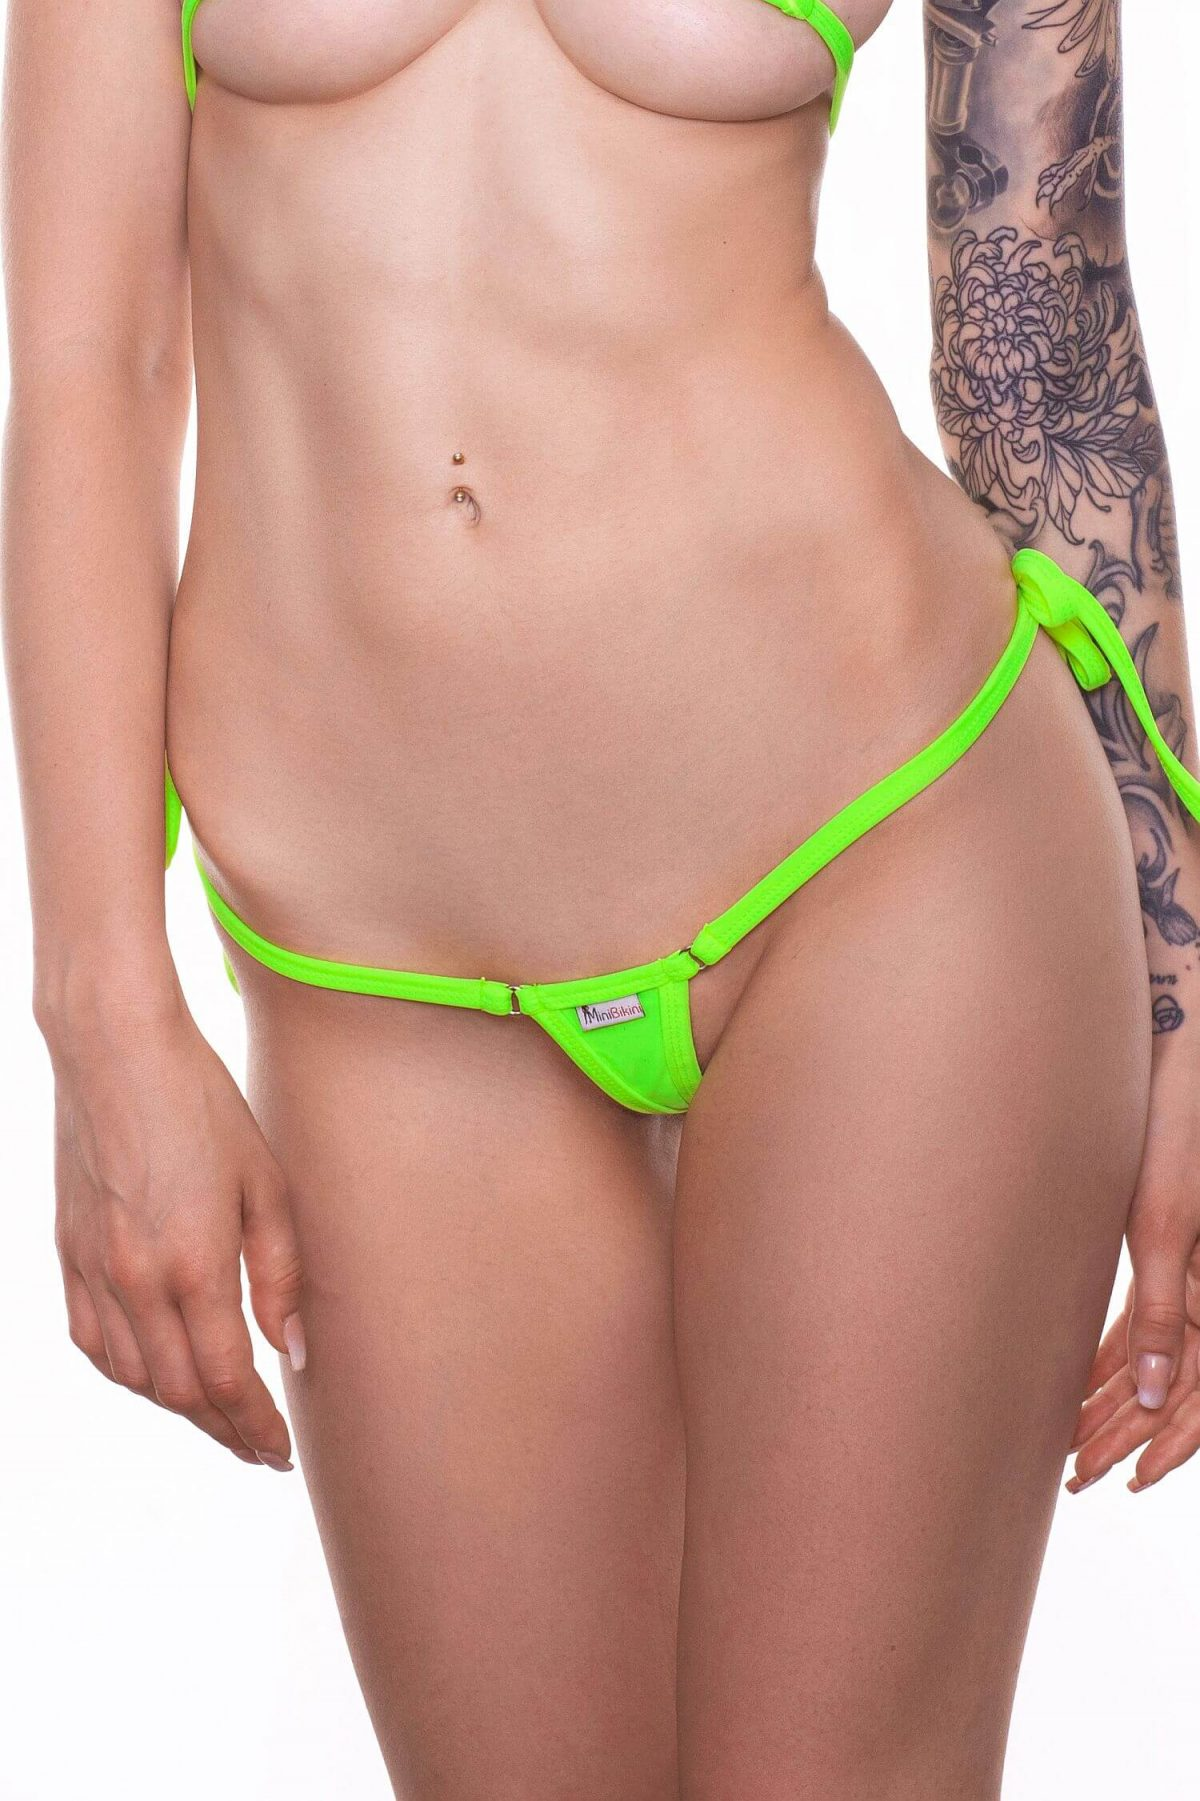 Neon bikini bottom with side ties